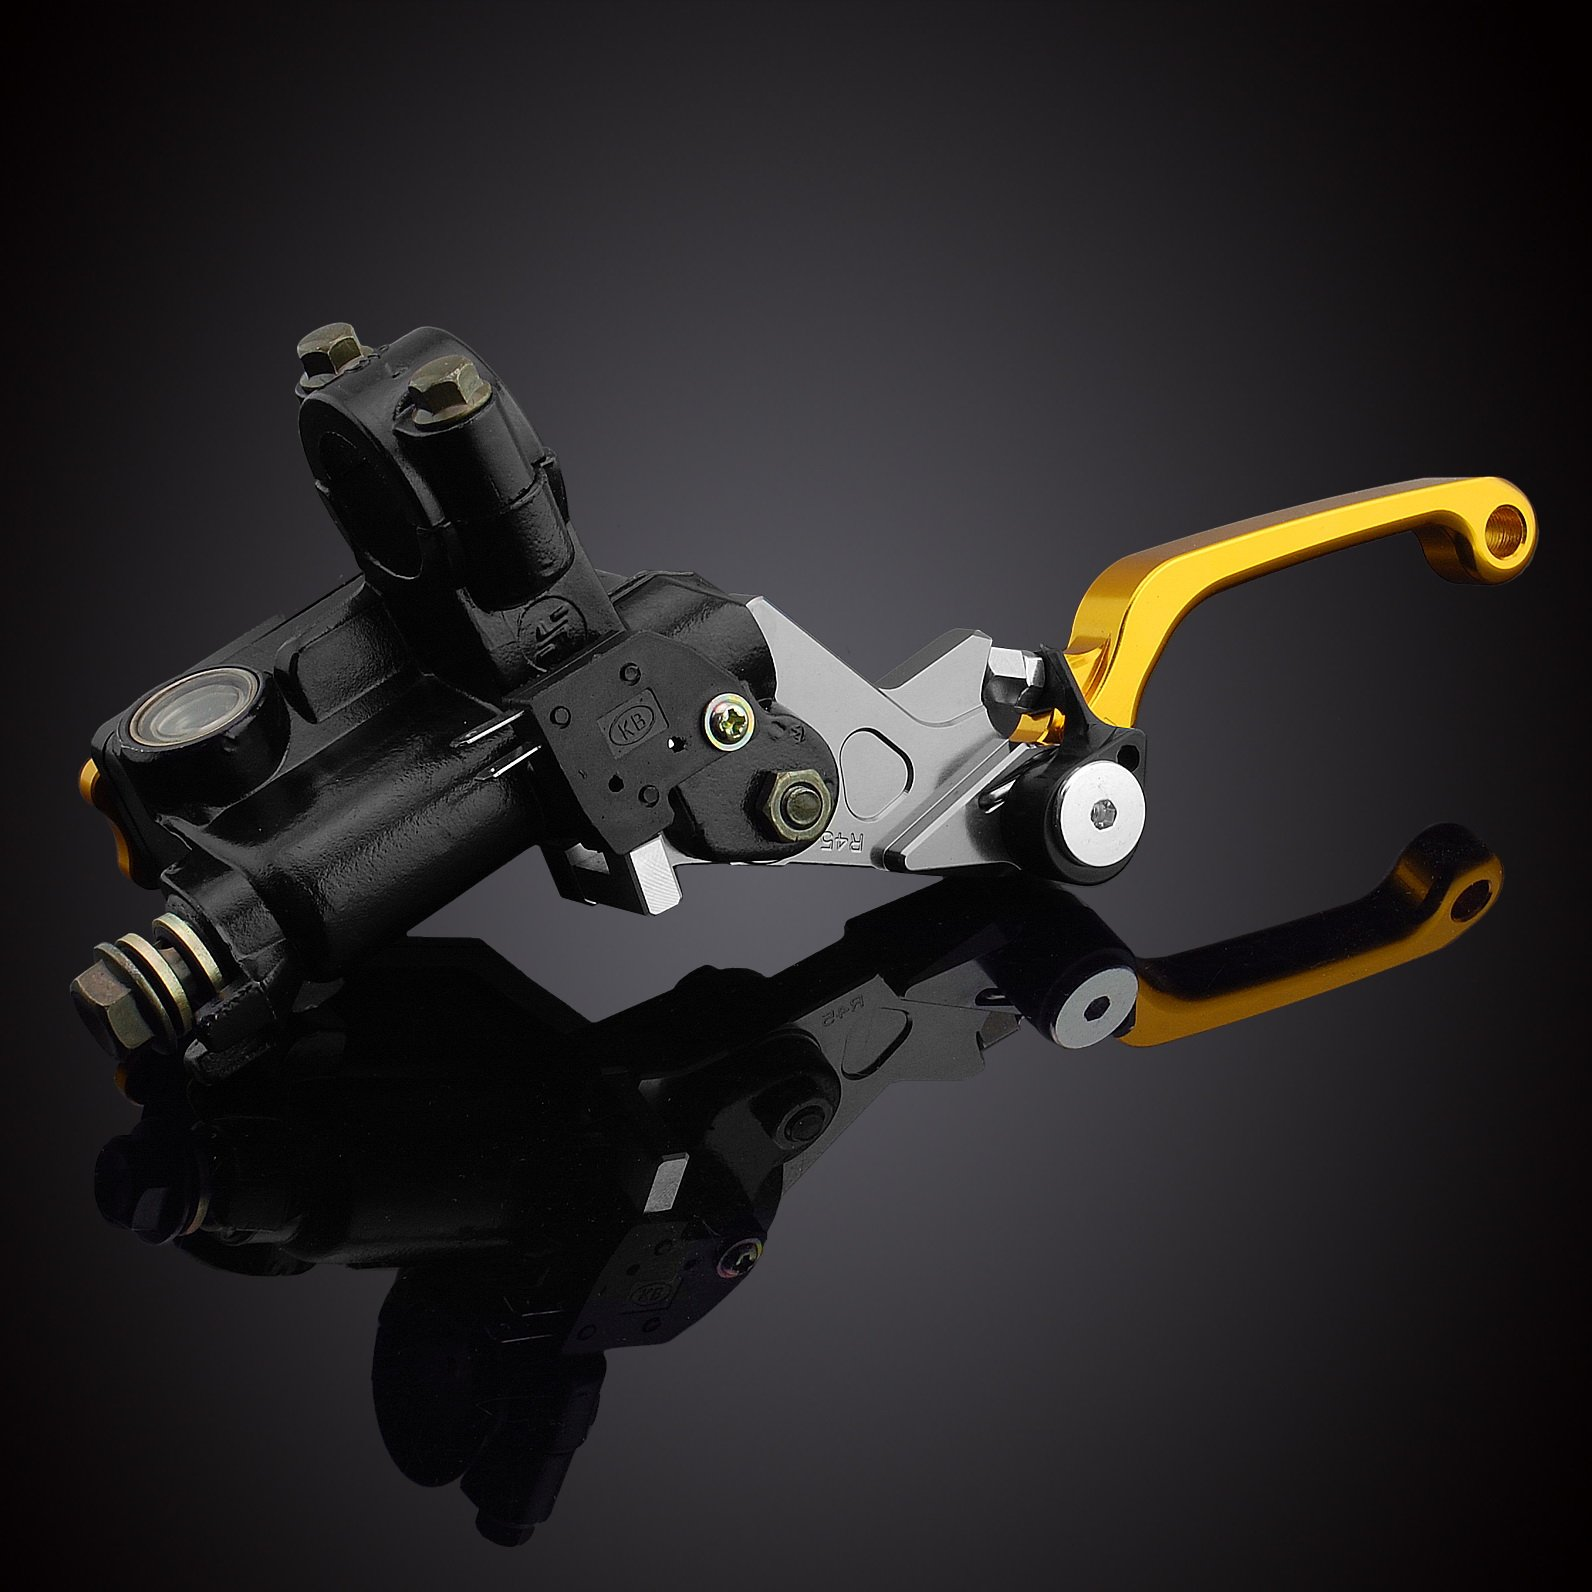 MZS 7/8 Brake Master Cylinder Reservoir Pivot Levers Set for Honda Yamaha Suzuki Kawasaki KTM (Gray) by MZS (Image #5)